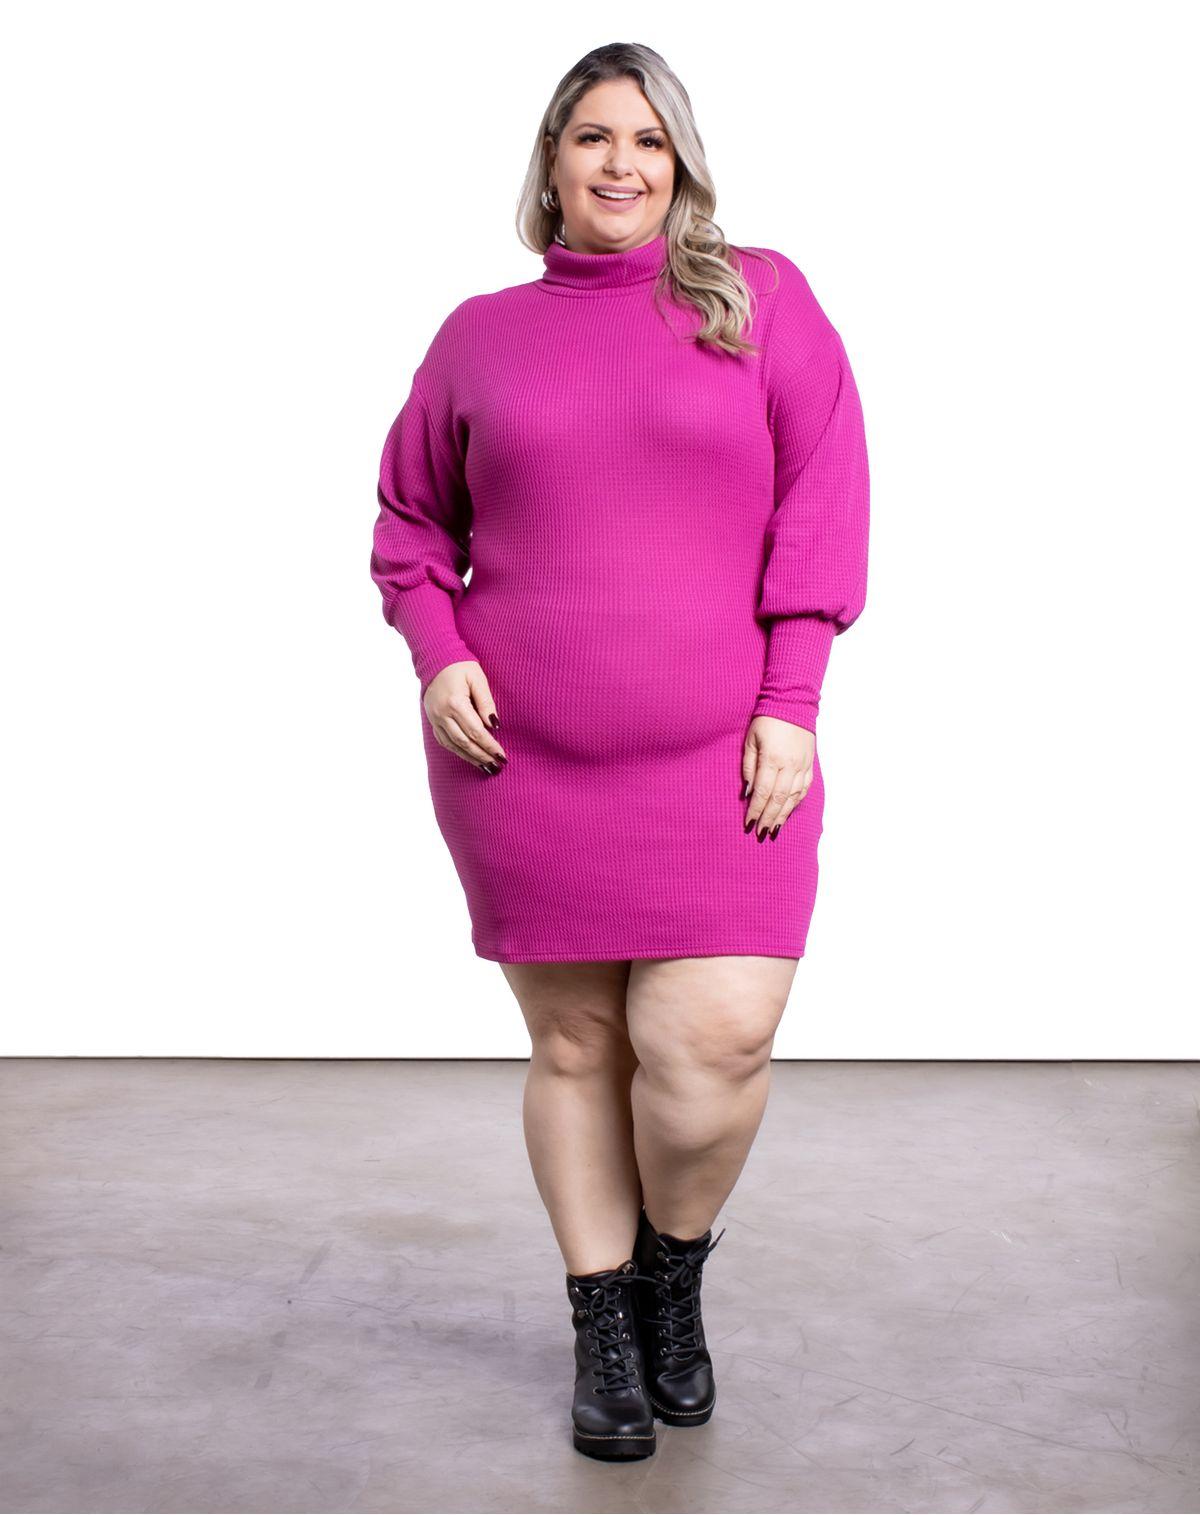 587799002-vestido-curto-plus-size-malha-manga-longa-feminino-pink-g2-96b